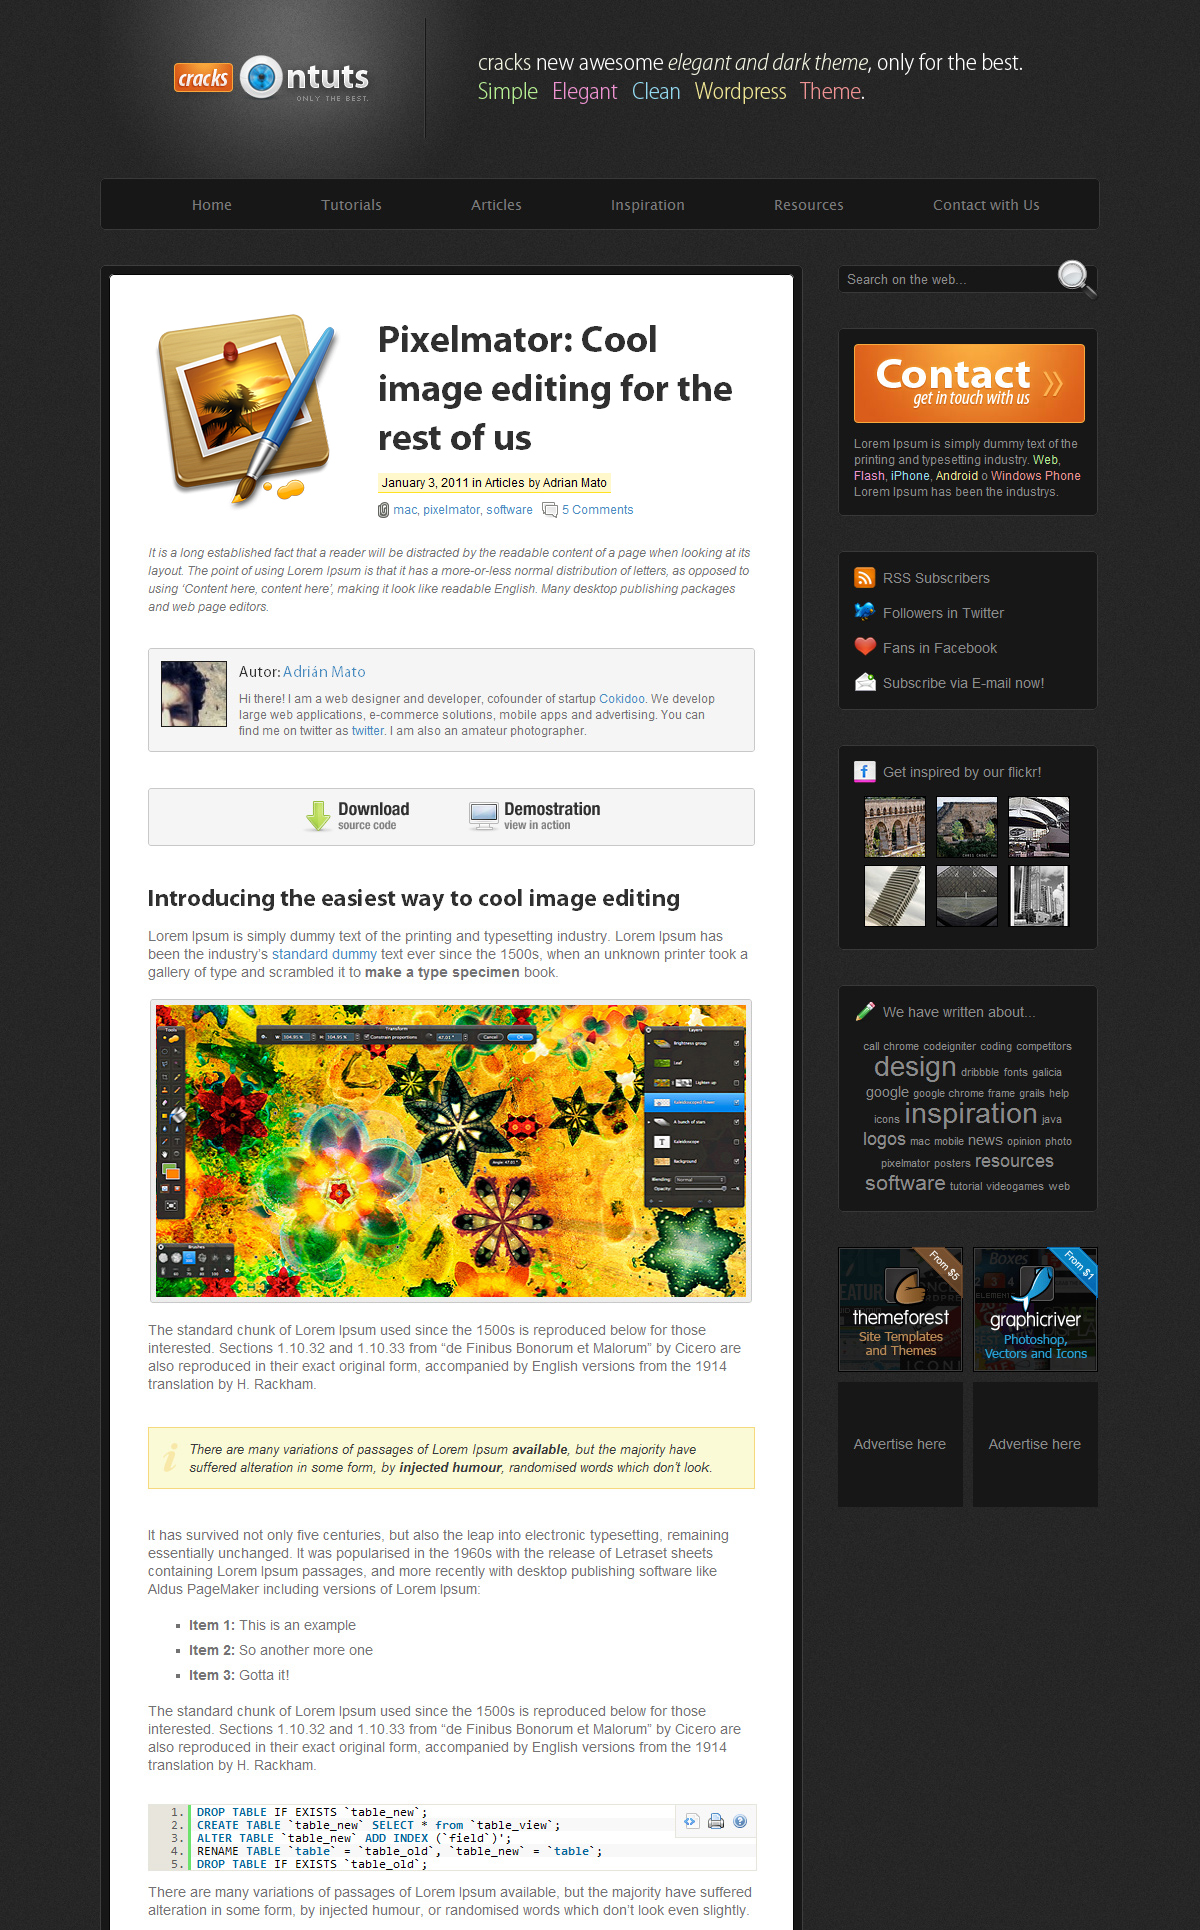 Cracks - Wordpress Community Theme by AdrianMG | ThemeForest